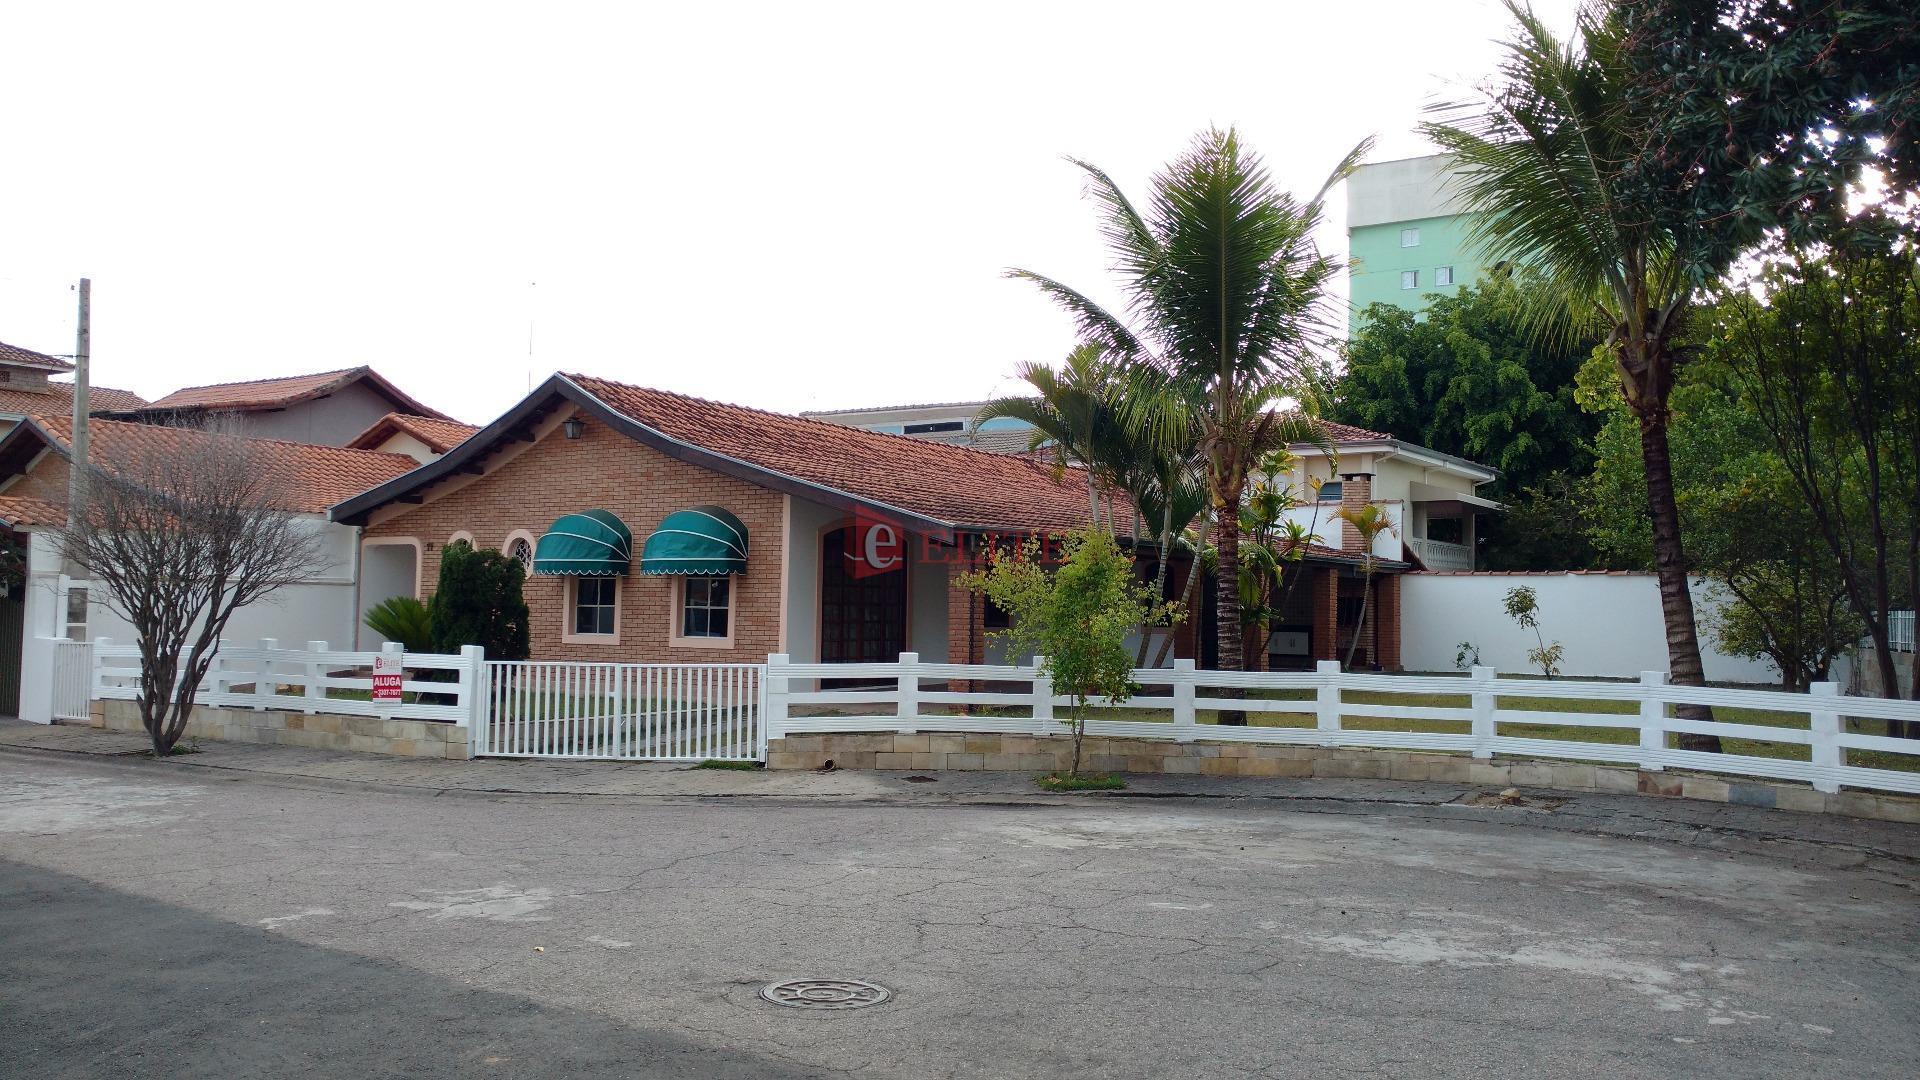 Alugar - Casa térrea condomínio Residencial Jardins, Jardim Satélite, São José dos Campos.